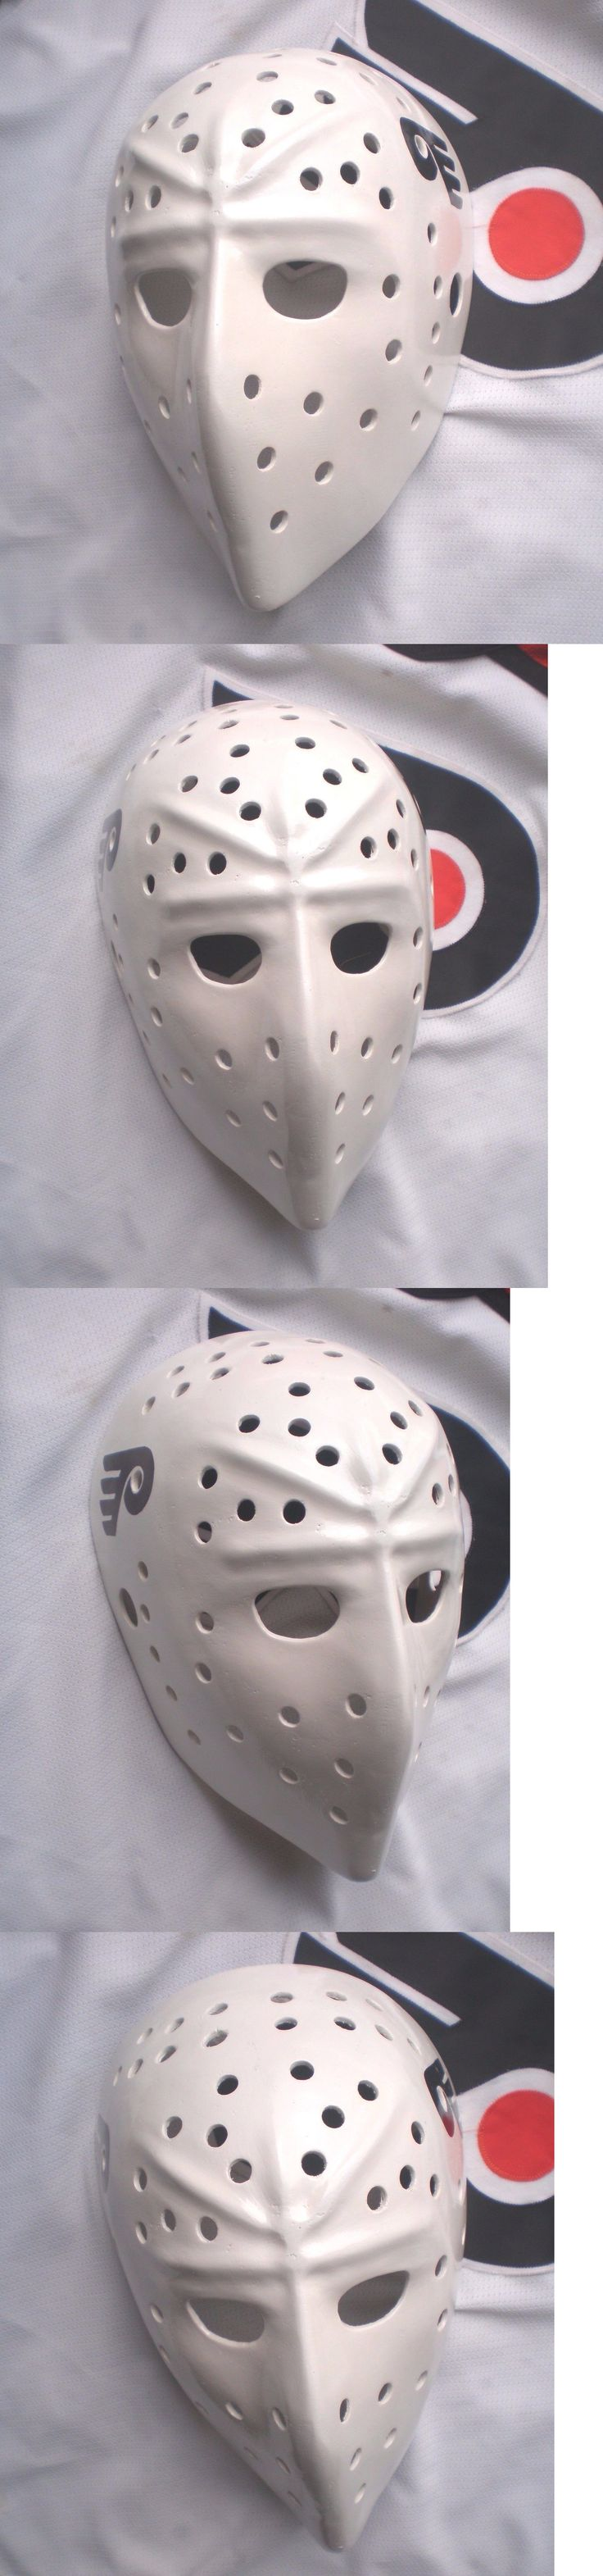 Face Masks 79762: Bernie Parent Philadelphia Flyers Fiberglass Nhl Hockey Goalie Mask Stunning! -> BUY IT NOW ONLY: $189.99 on eBay!